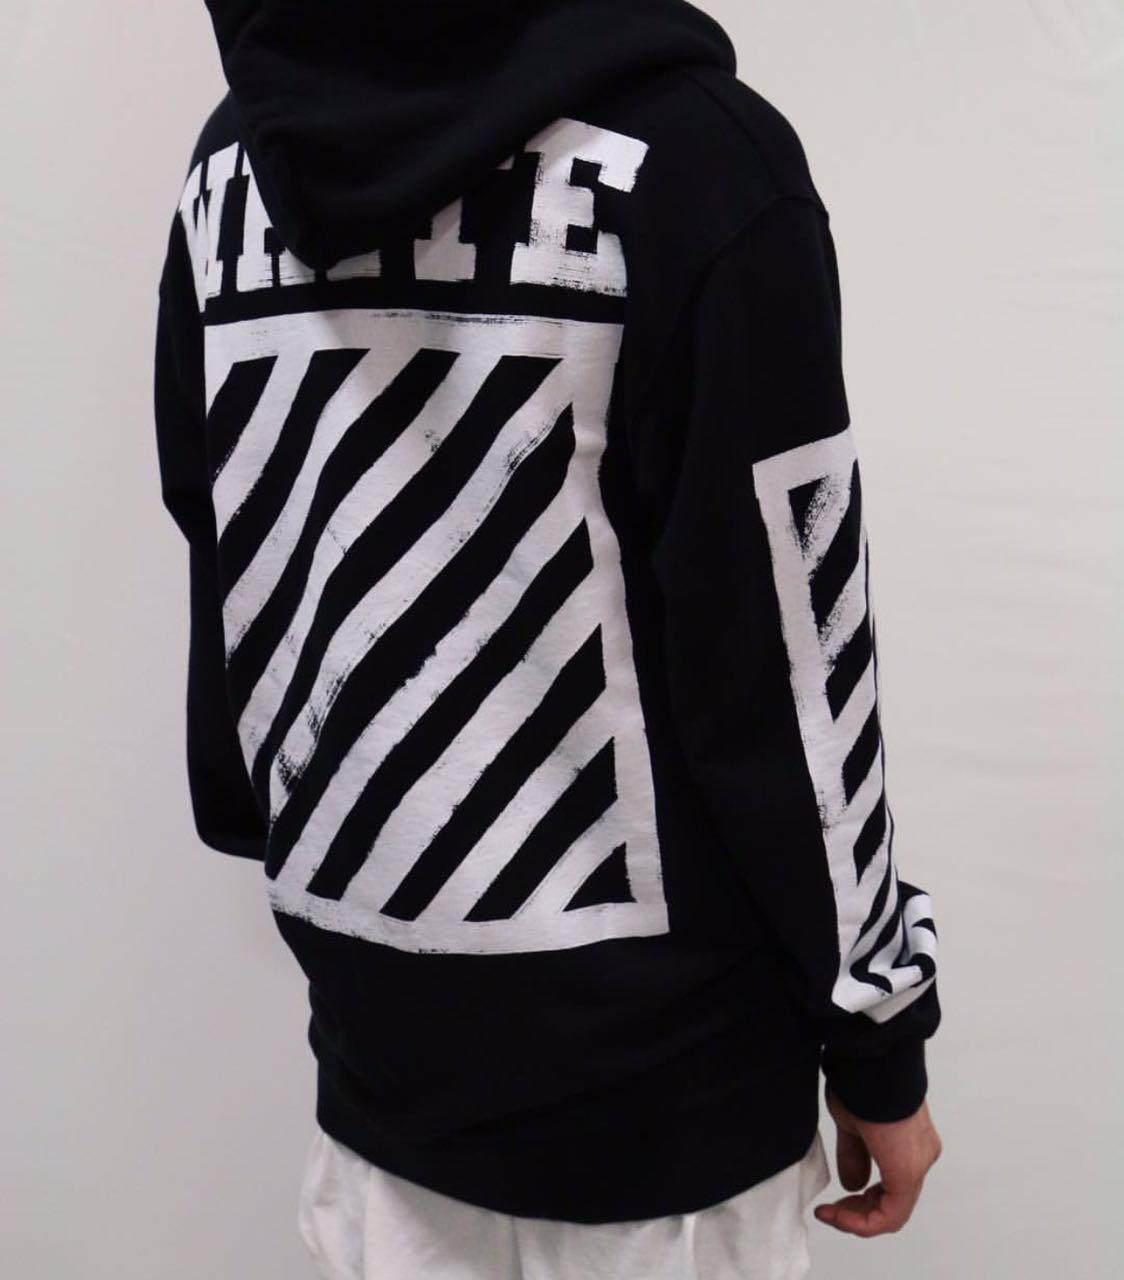 8fd54f3b07f6 Off-White Black Graffiti Hoodie. Previous  Next